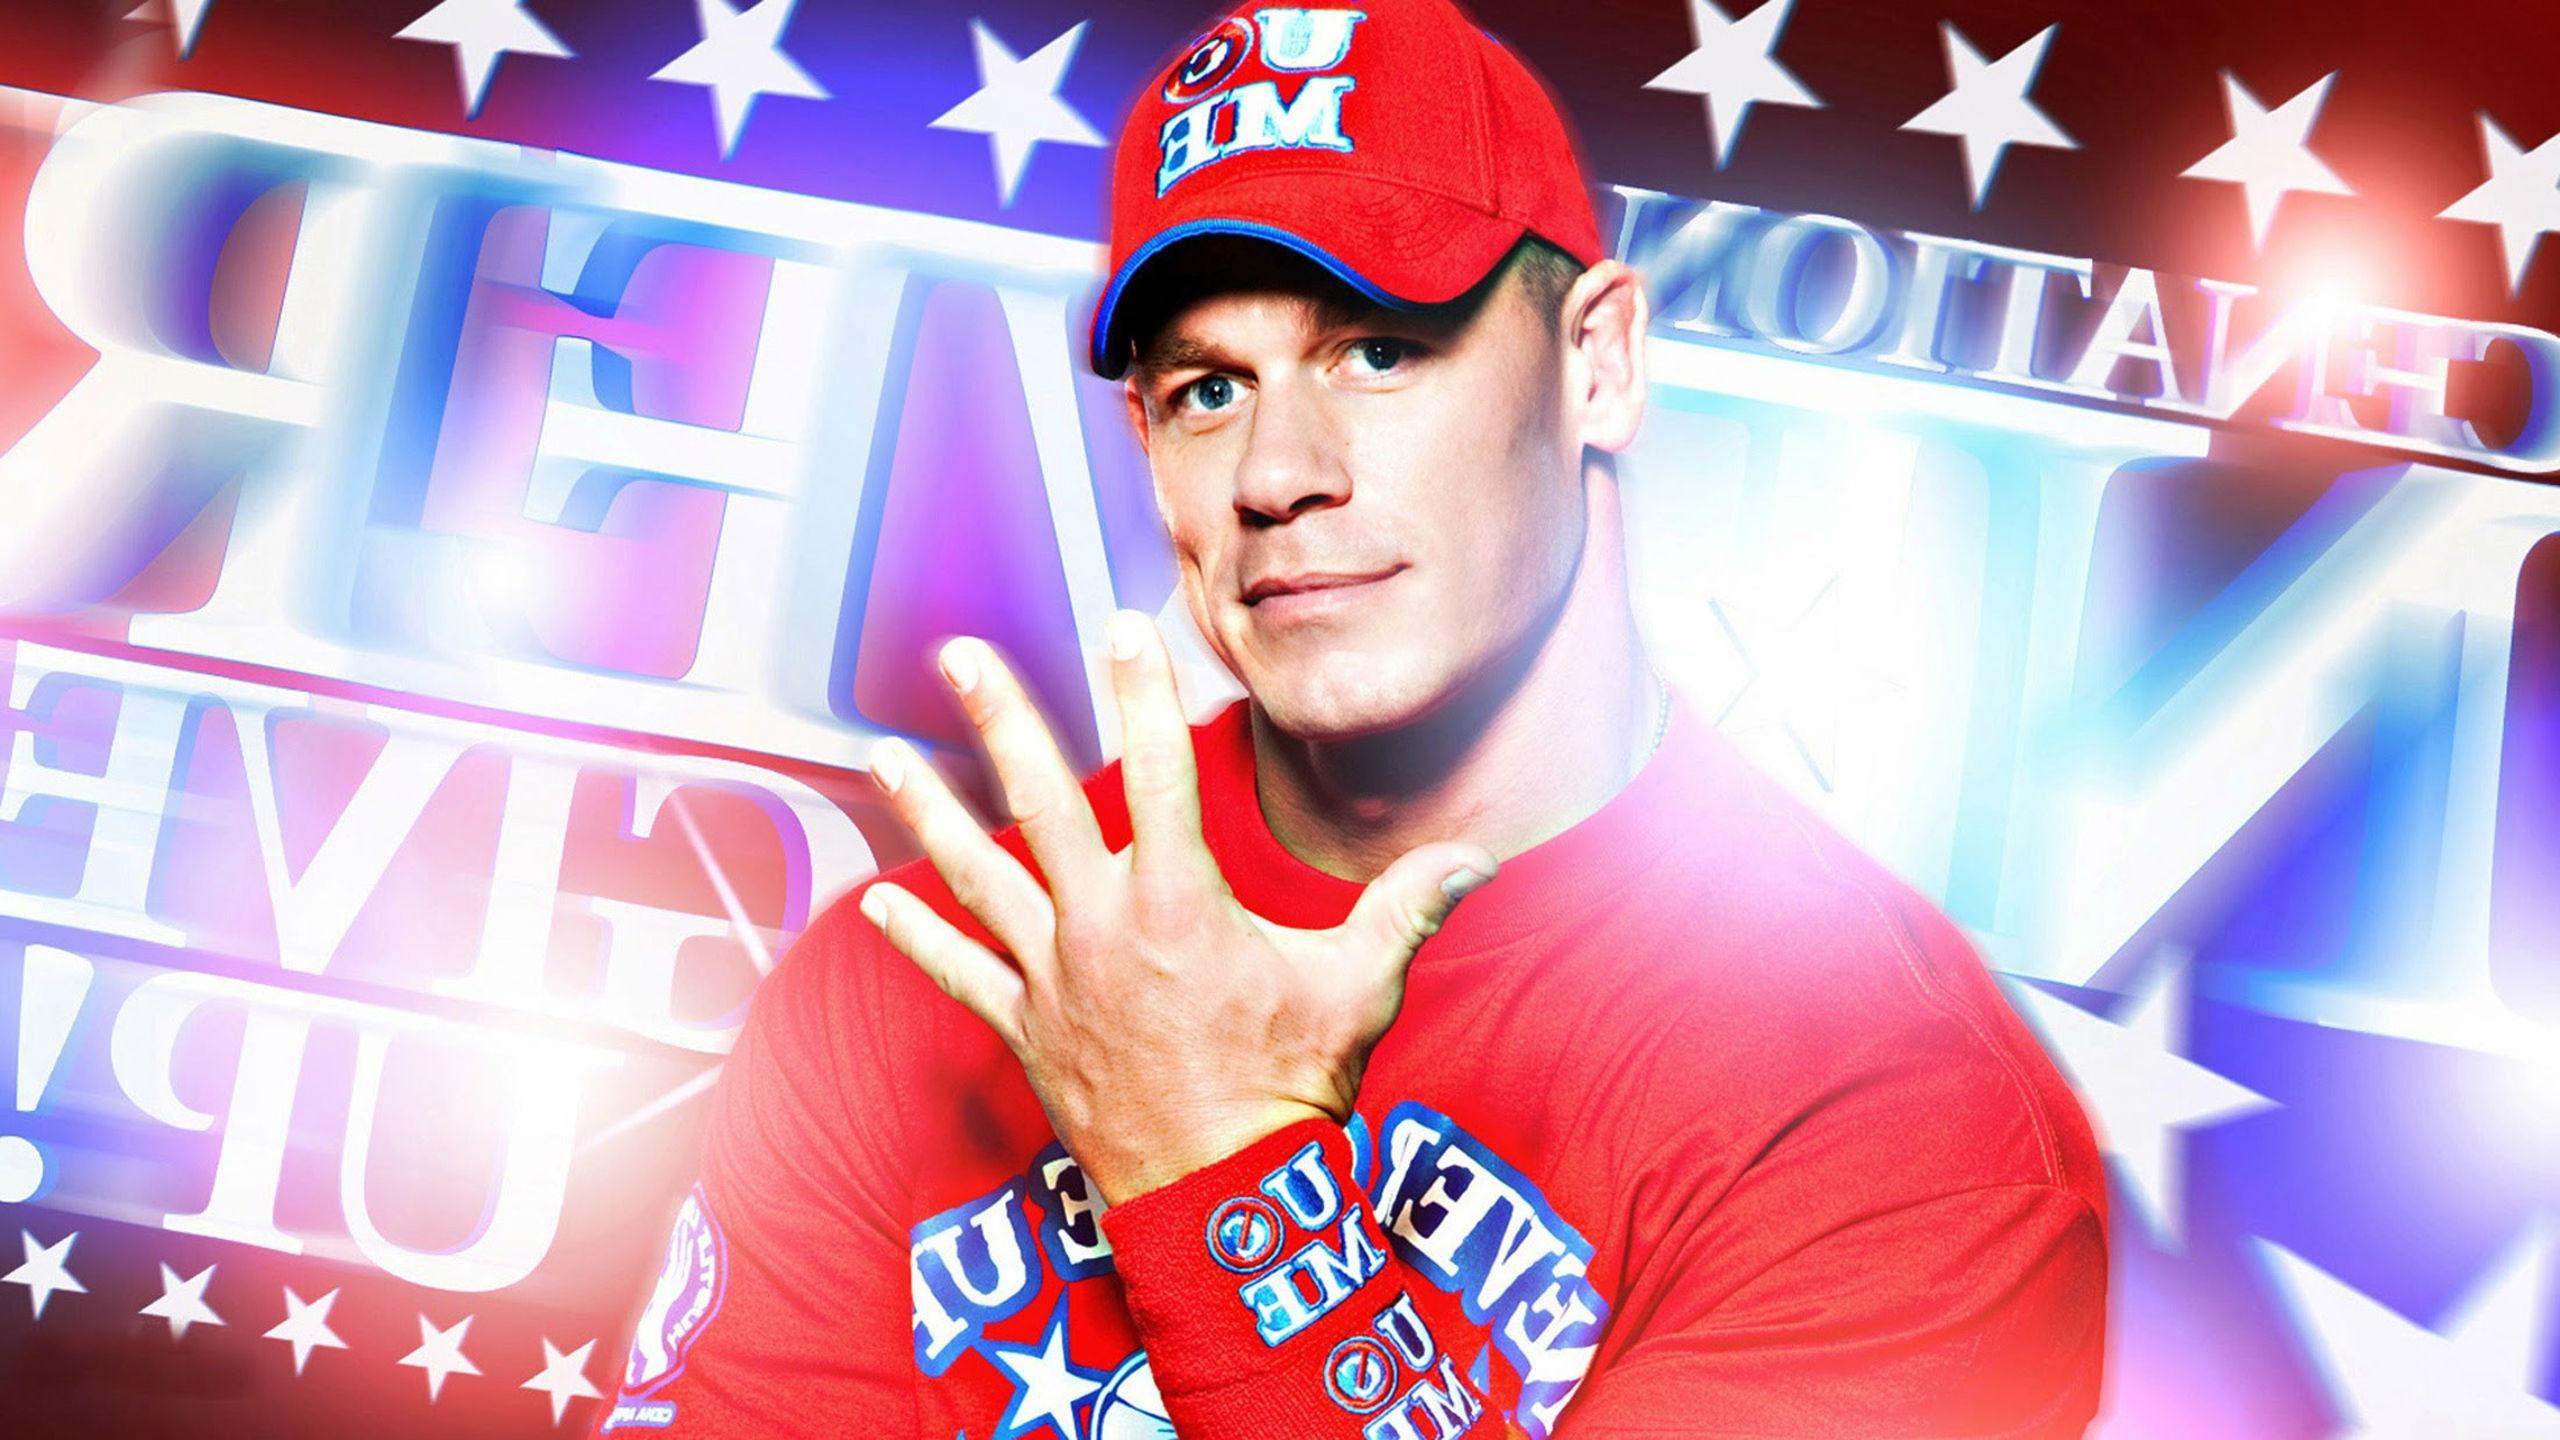 WWE Superstar John Cena Latest HD Wallpapers And New Photos 640×480 John  Cena Hd